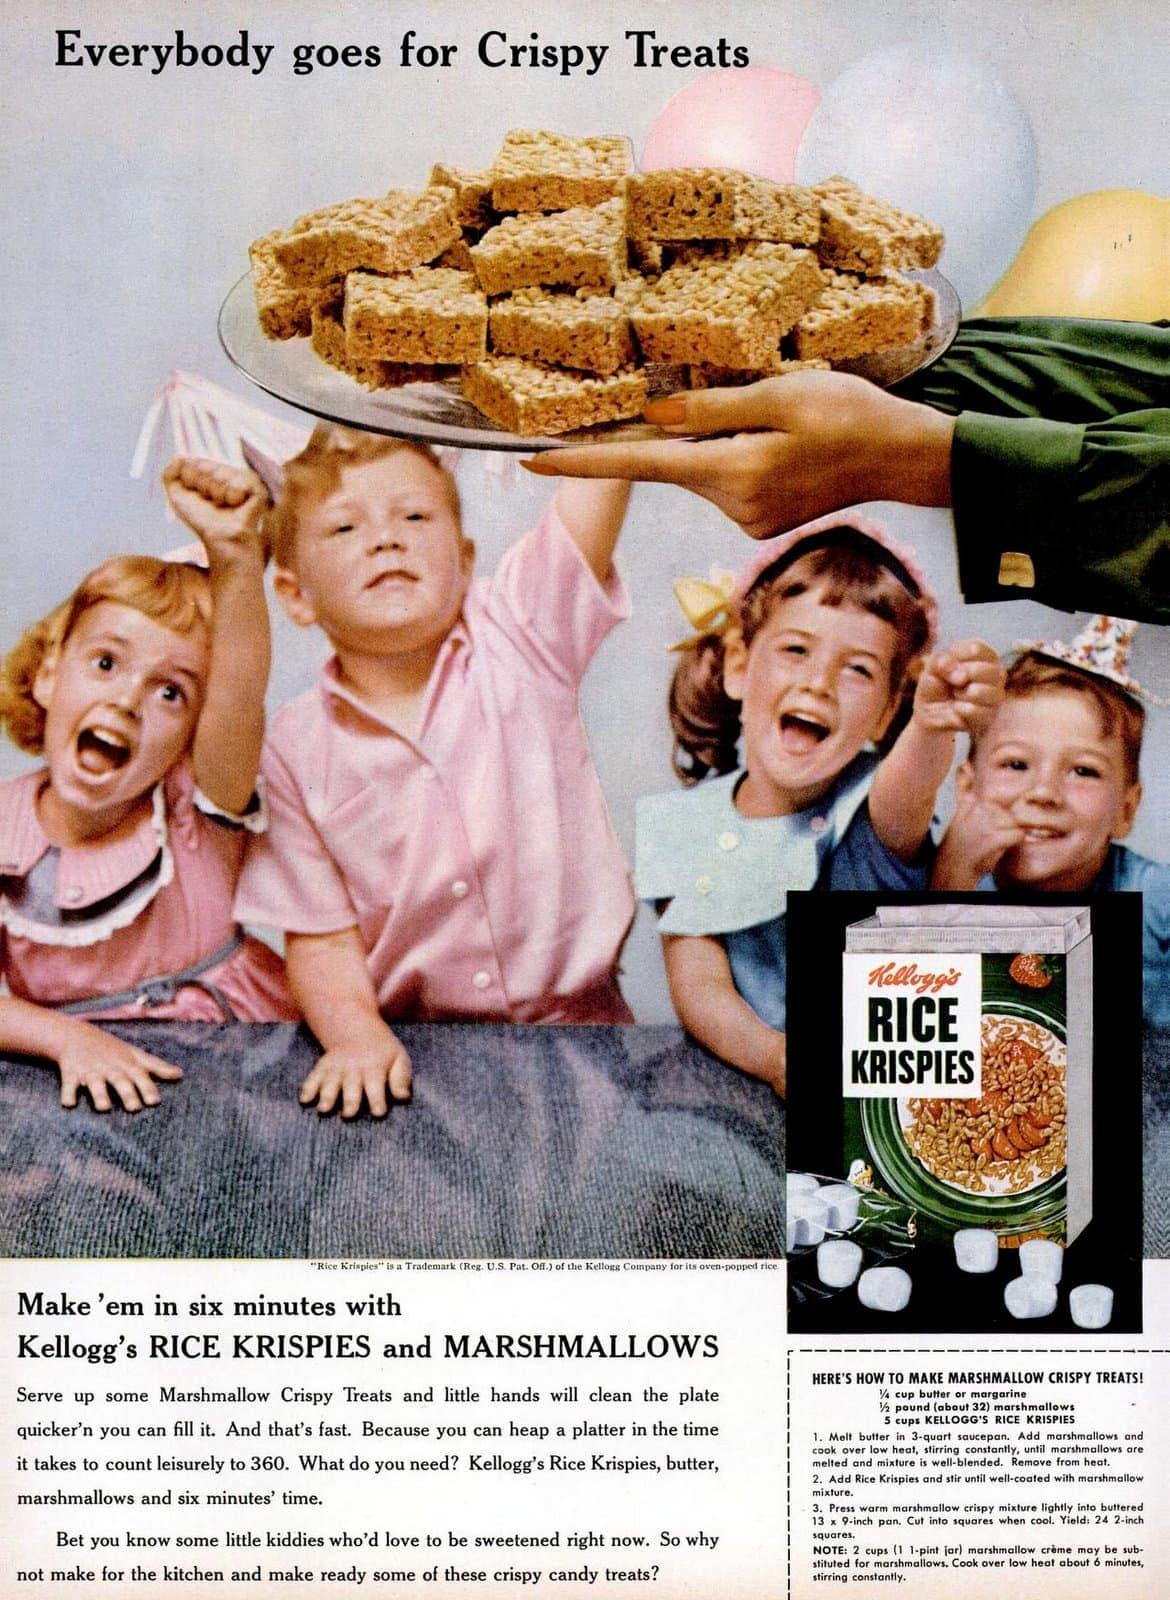 Original Rice Krispies Treats recipe - Marshmallow Crispy Treats (1955)